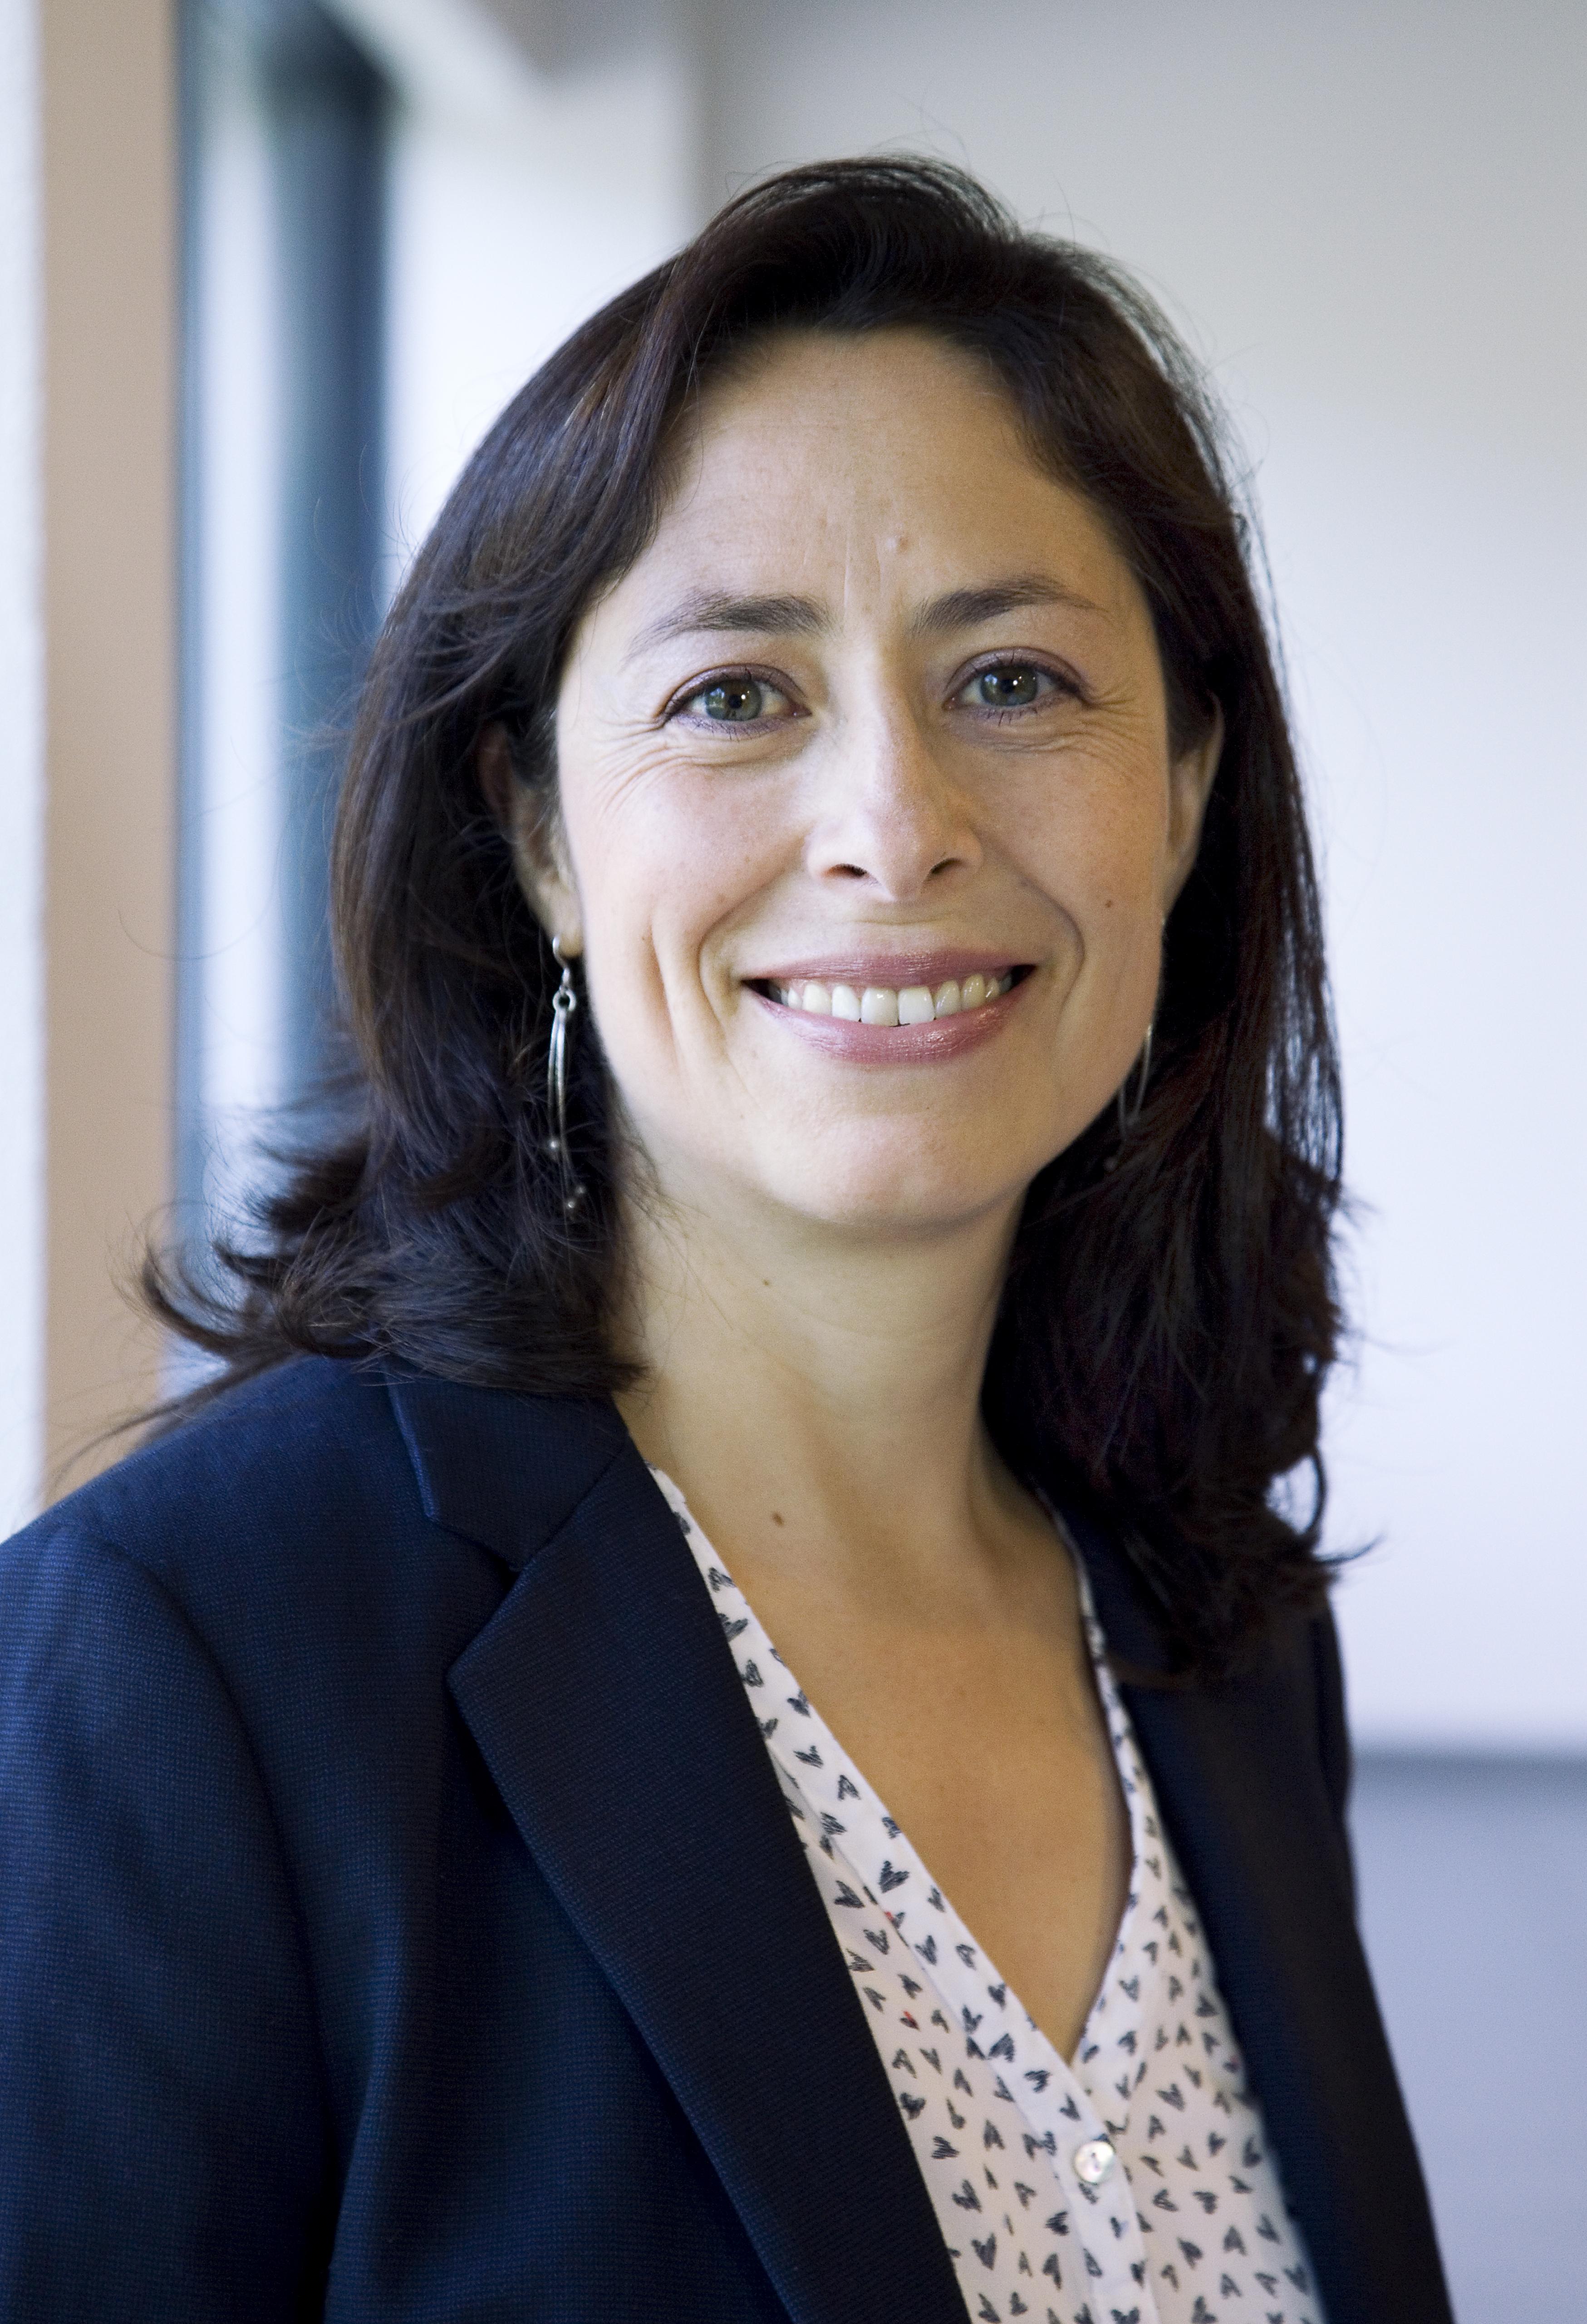 Brenda Gallardo Torres